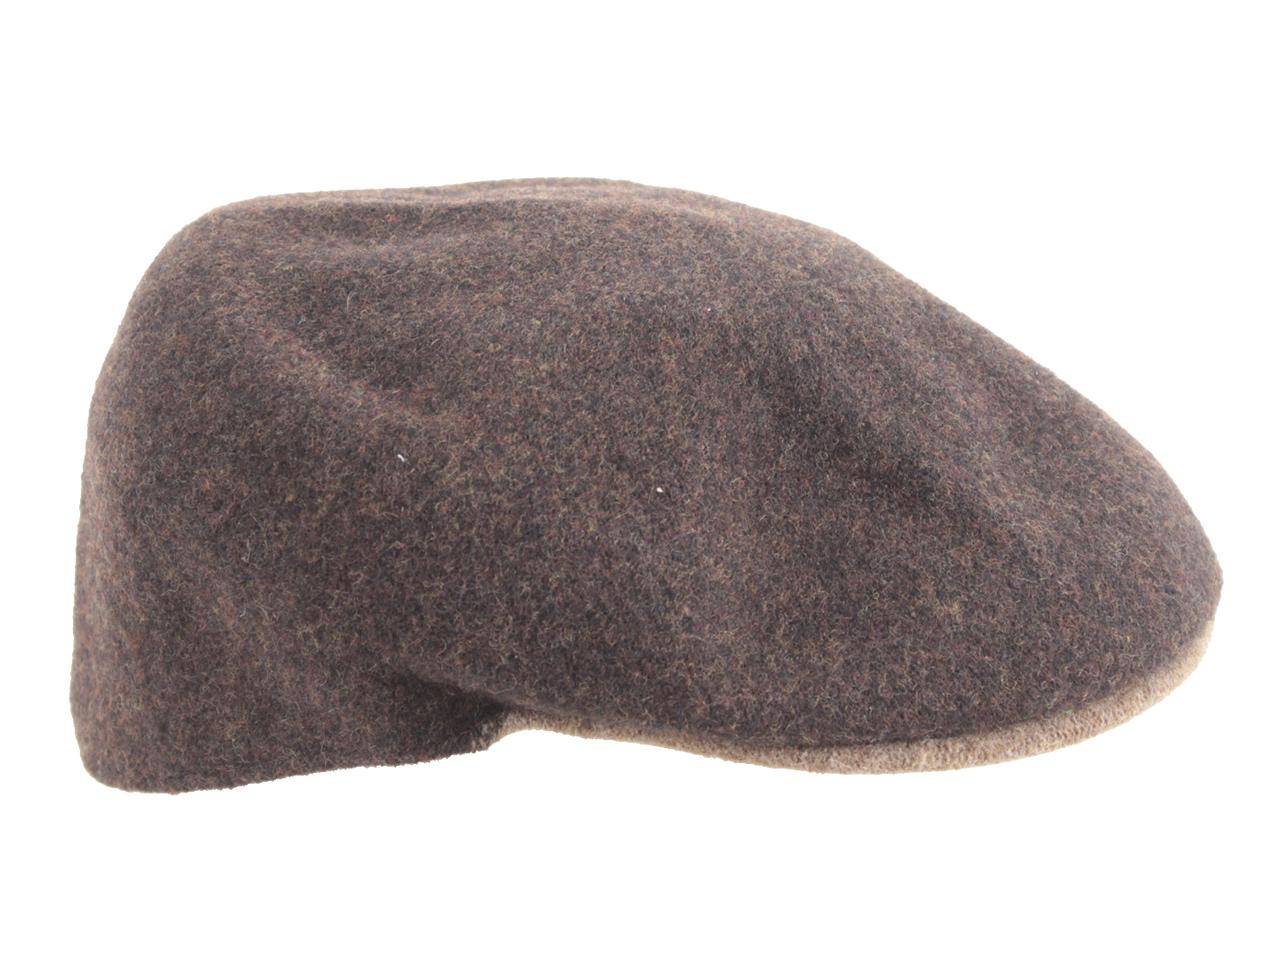 b7c3d9ef50 Details about Kangol Men's Wool 504-S Flat Cap Hat